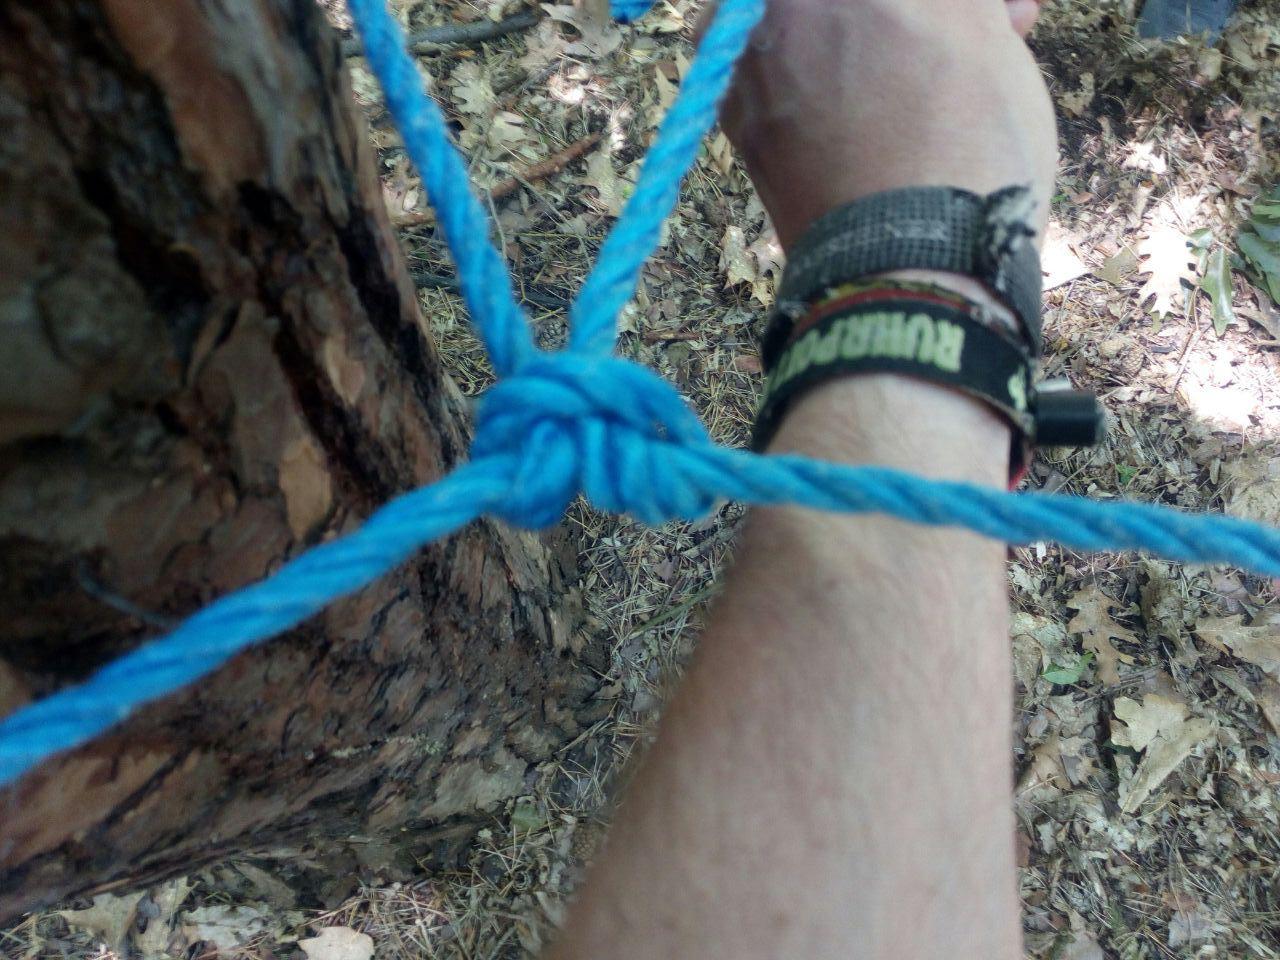 Der Samariter-Knoten. Danke! Den merk ich mir!